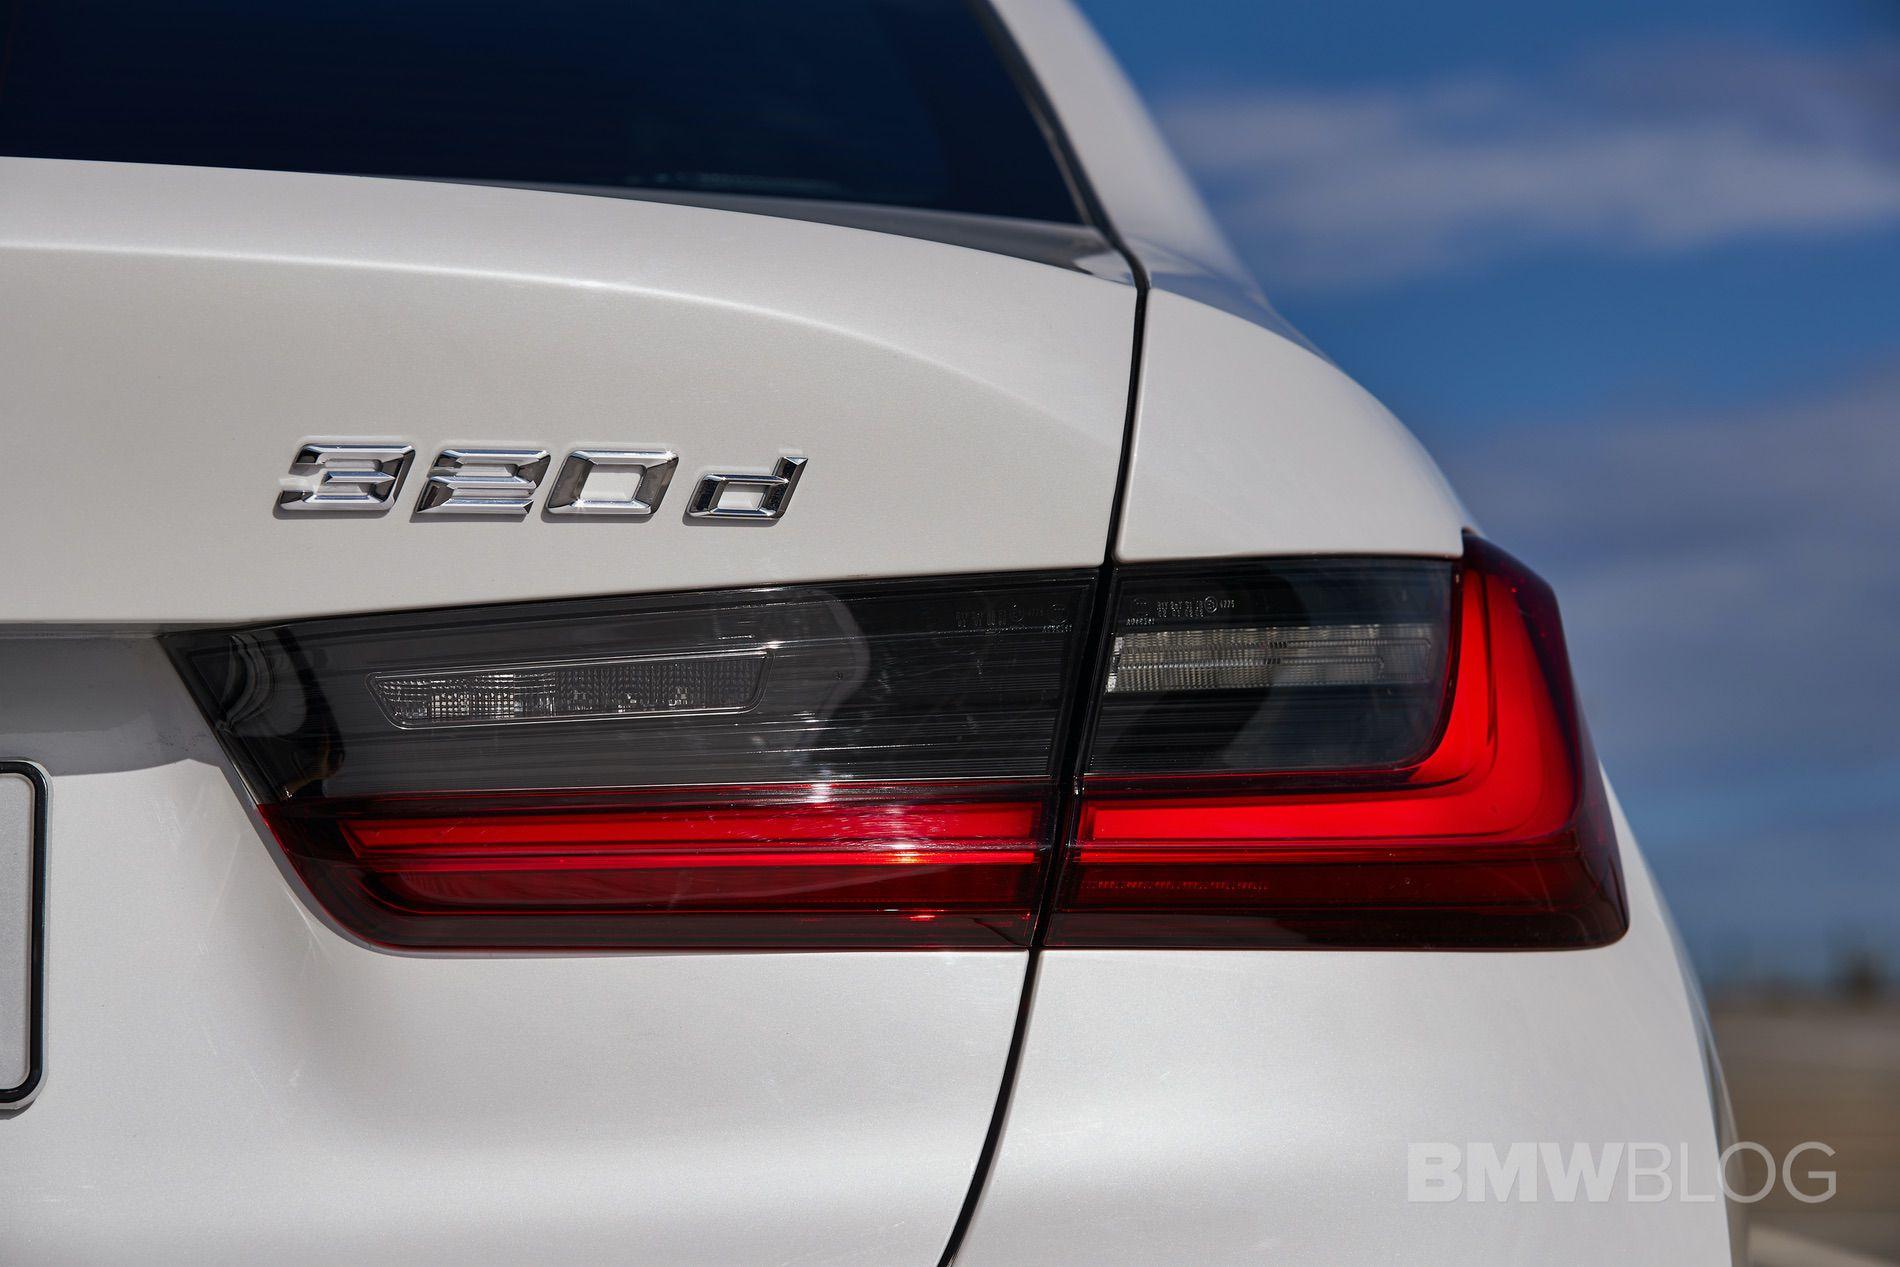 2019 BMW 320d G20 test drive 97